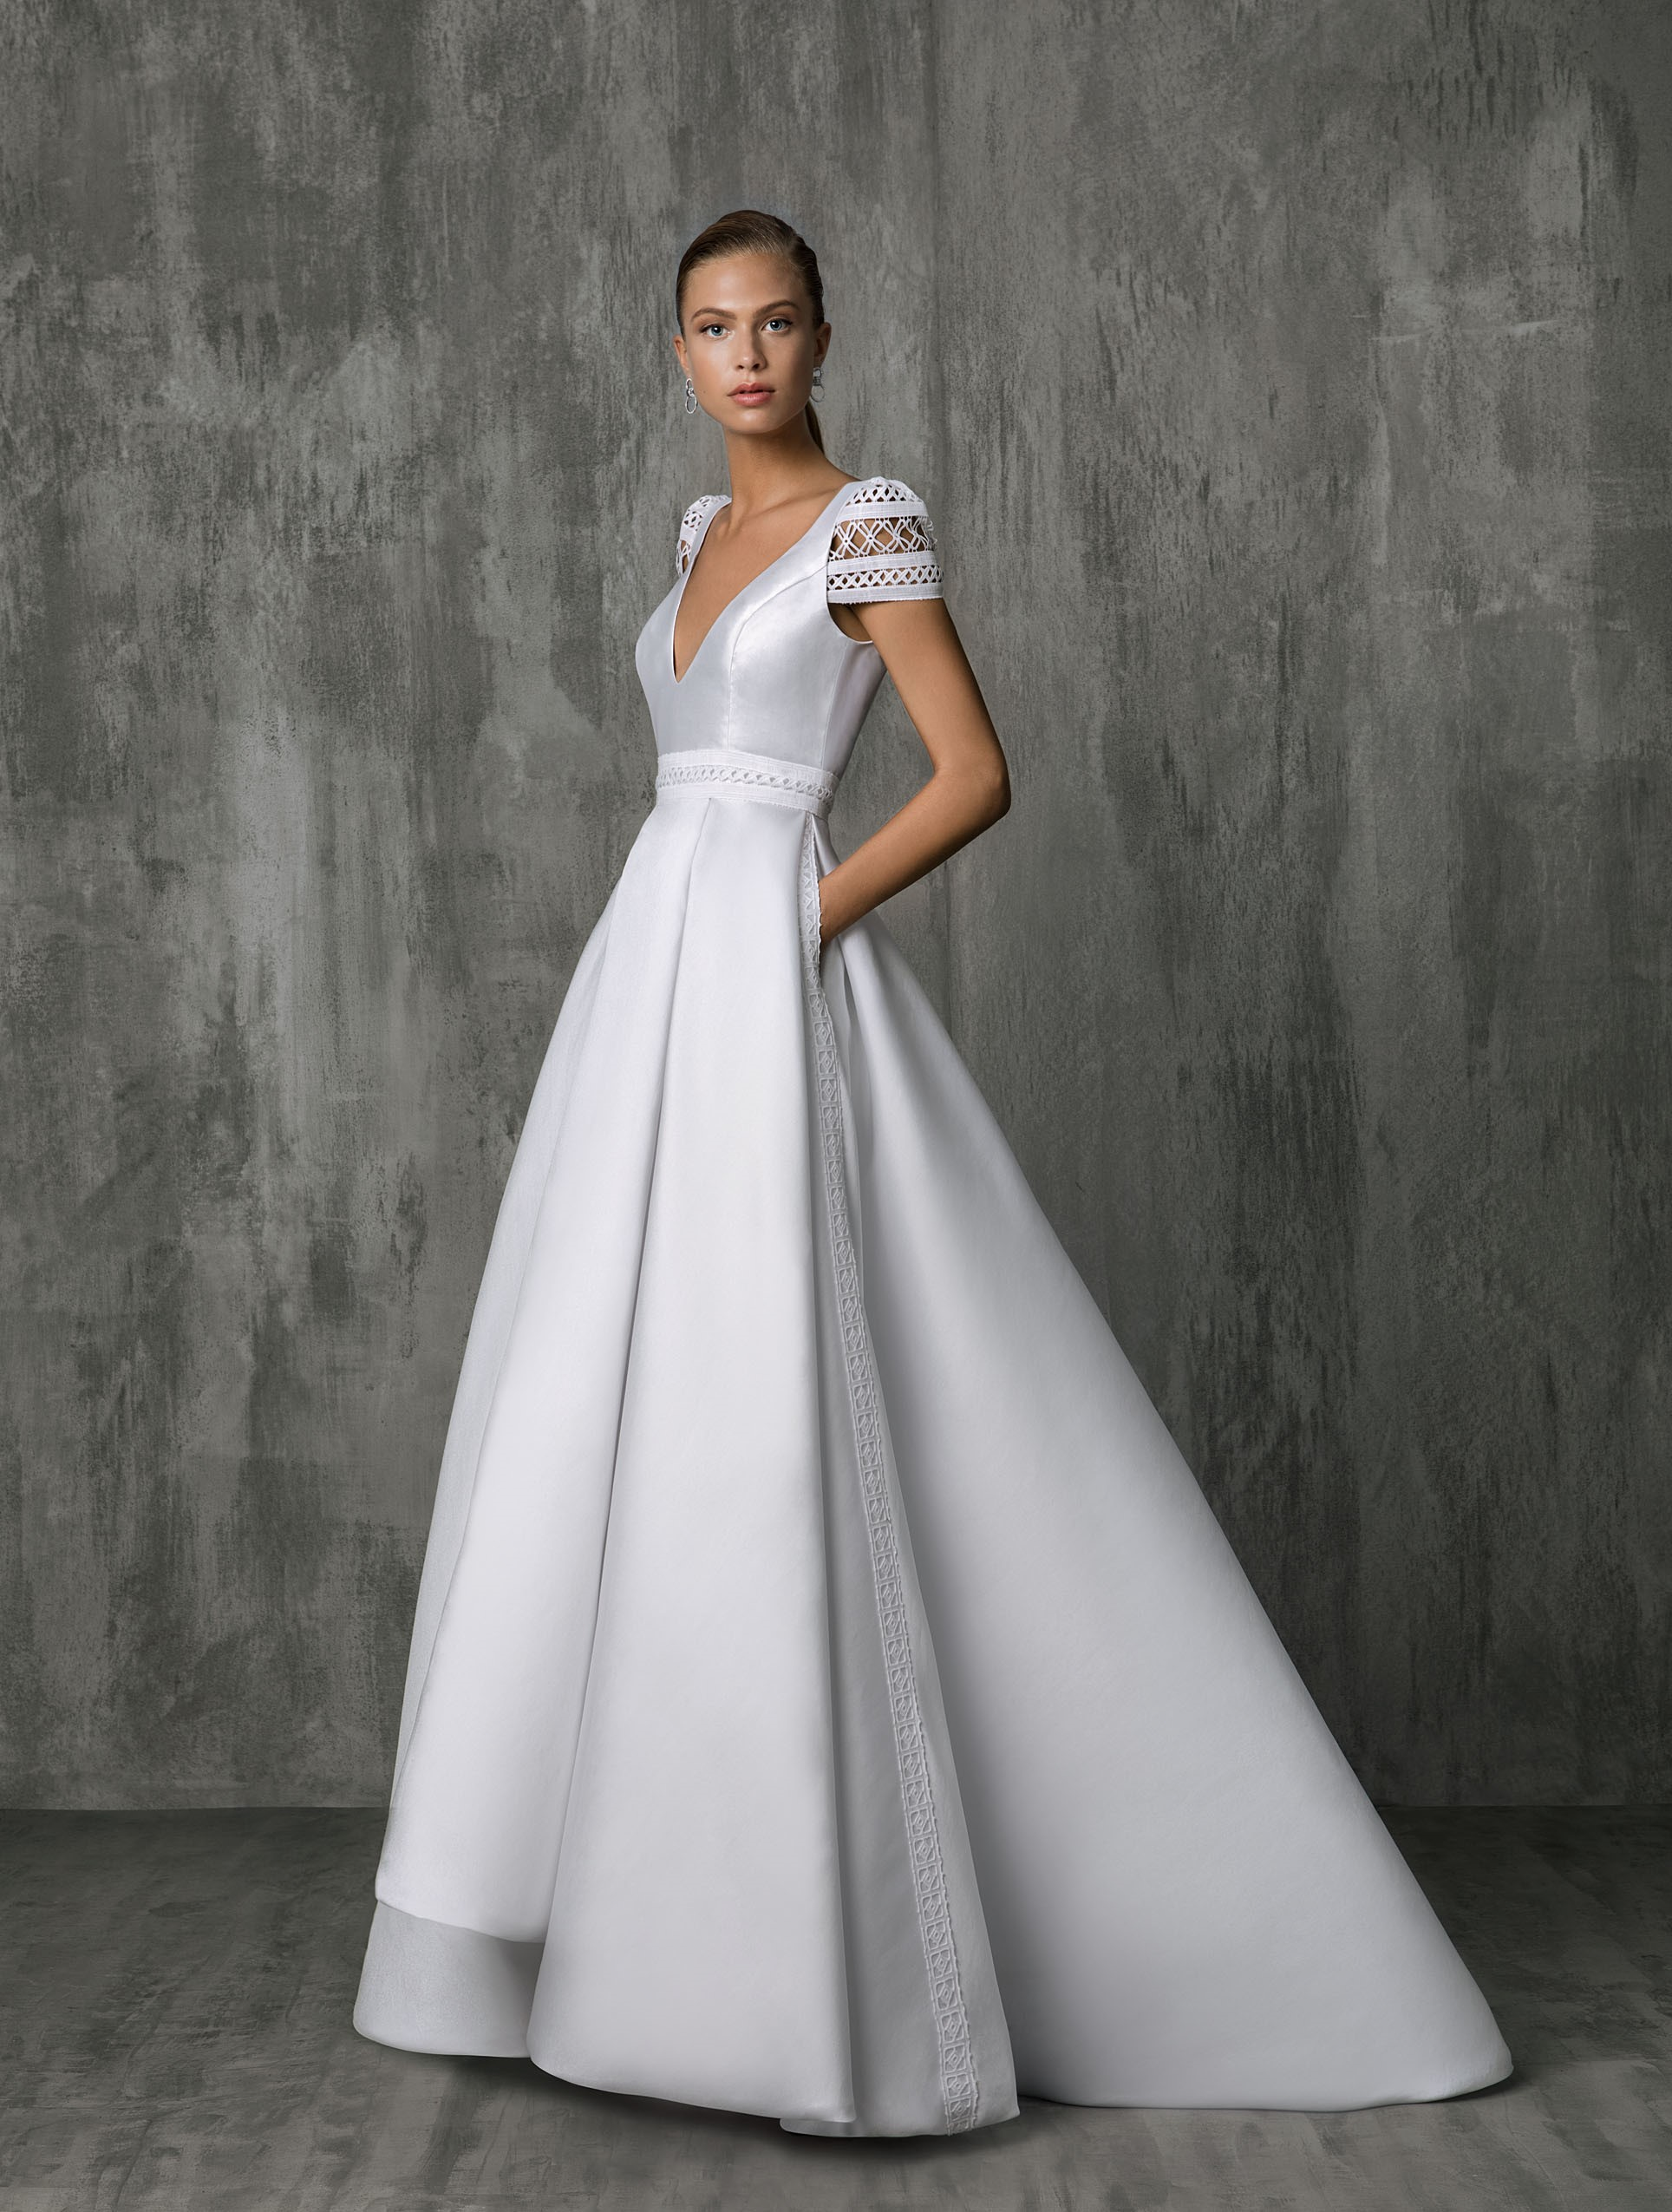 ae584d2fc49 Stunning Victoria Kyriakides wedding dressed